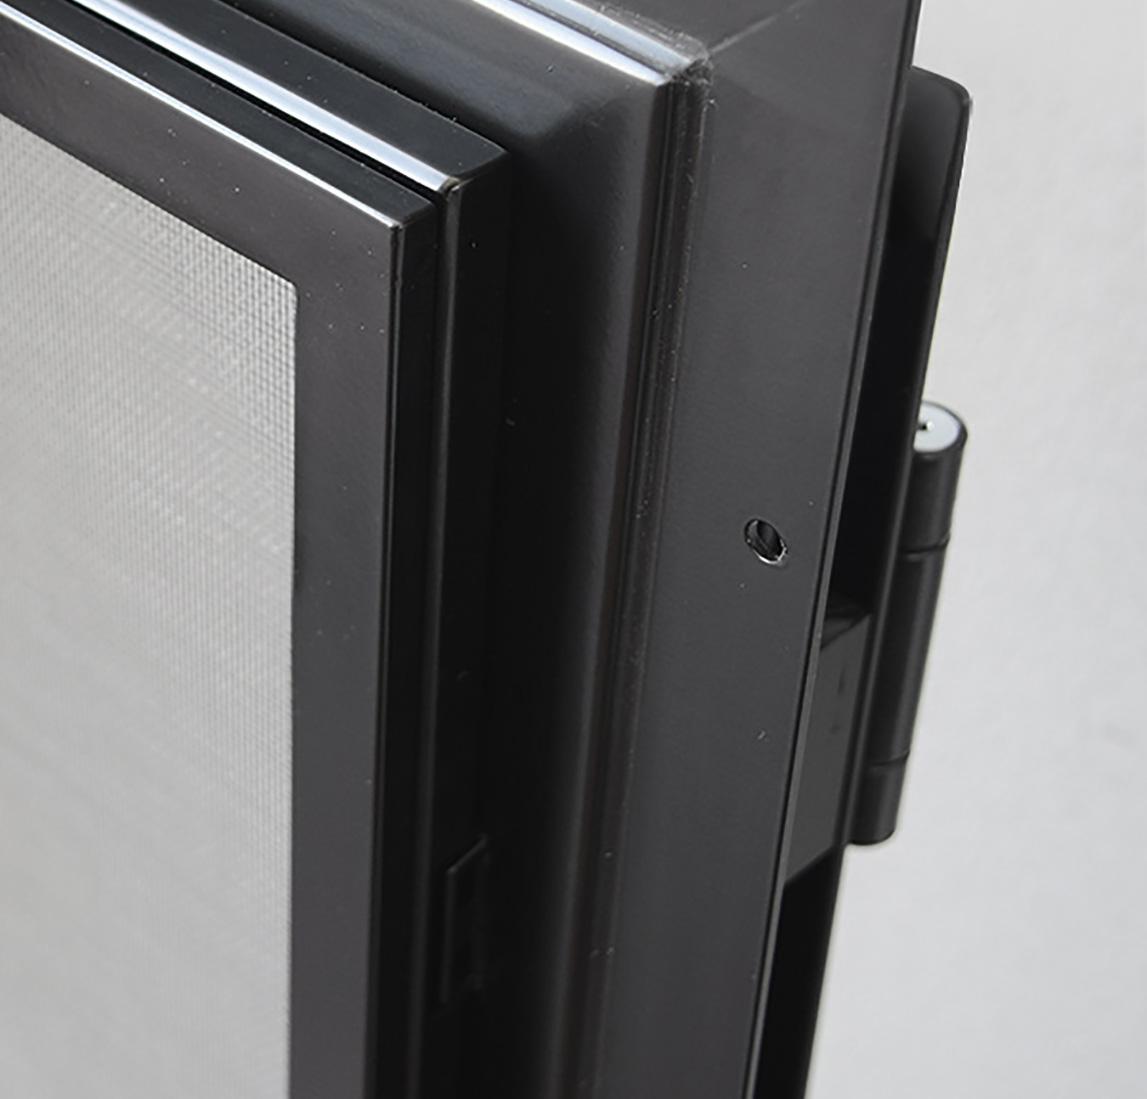 Windows and doors screens: Fixed Magnetic screen model